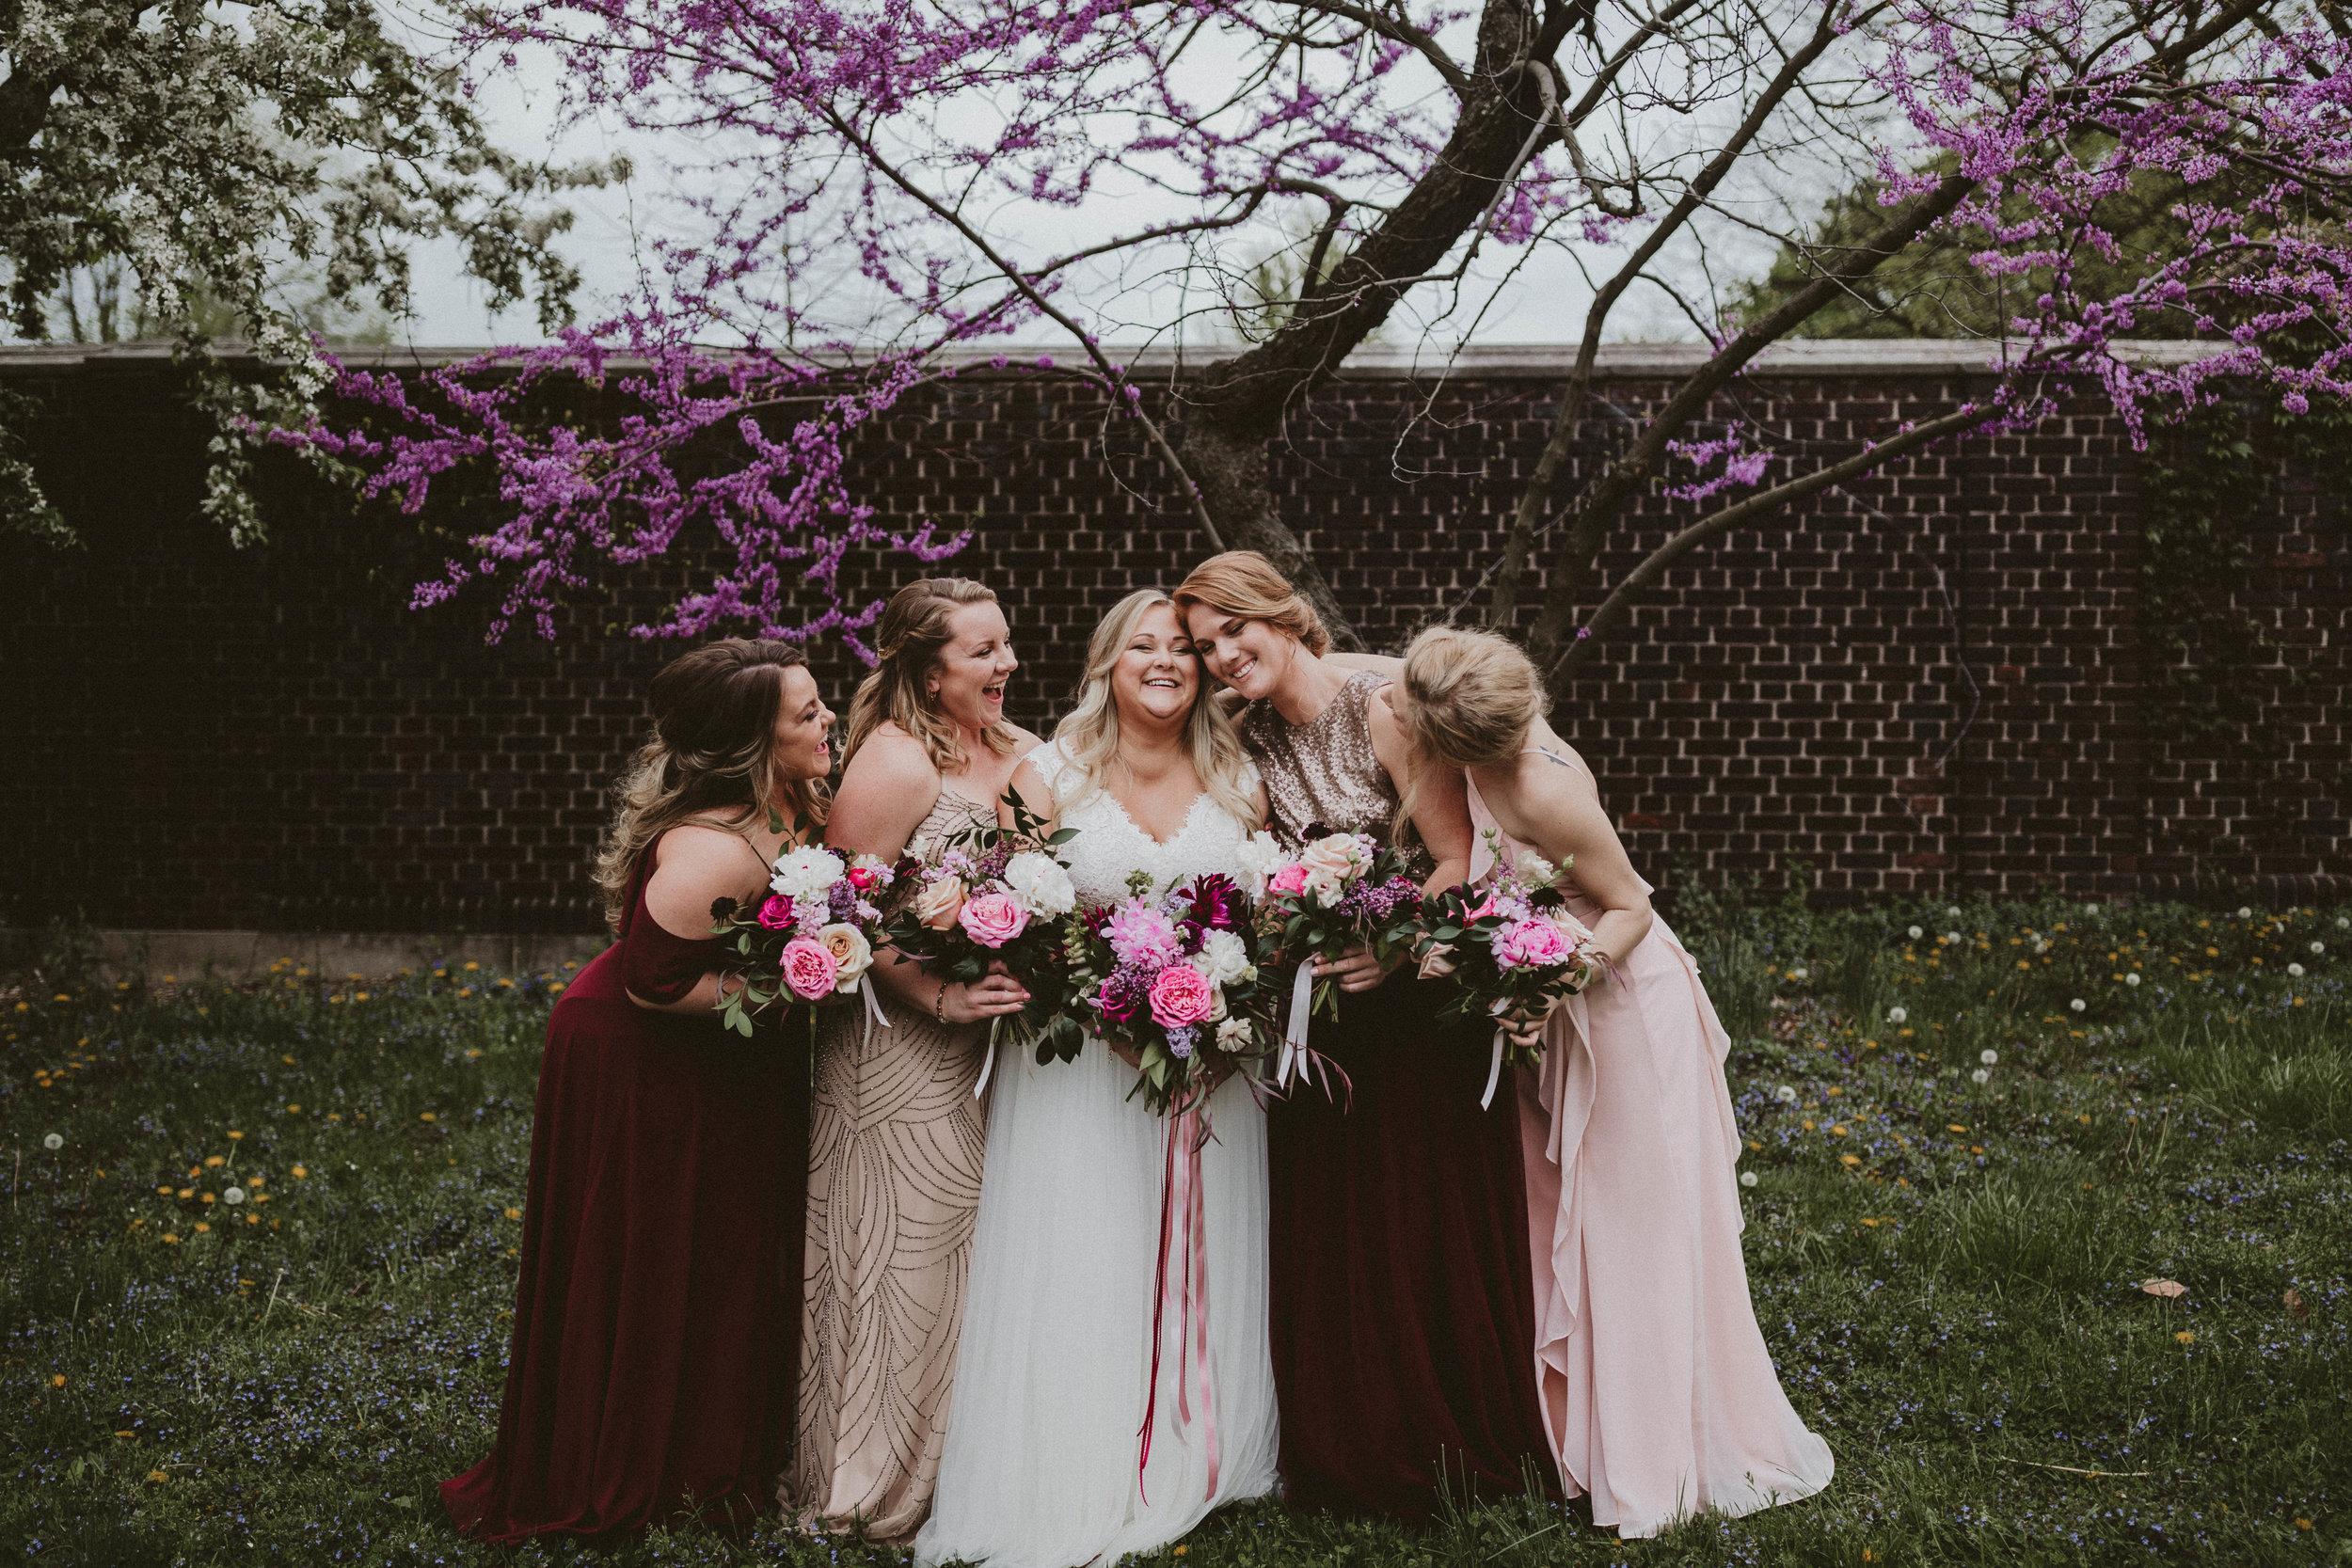 pittsburgh wedding photographer-278.jpg